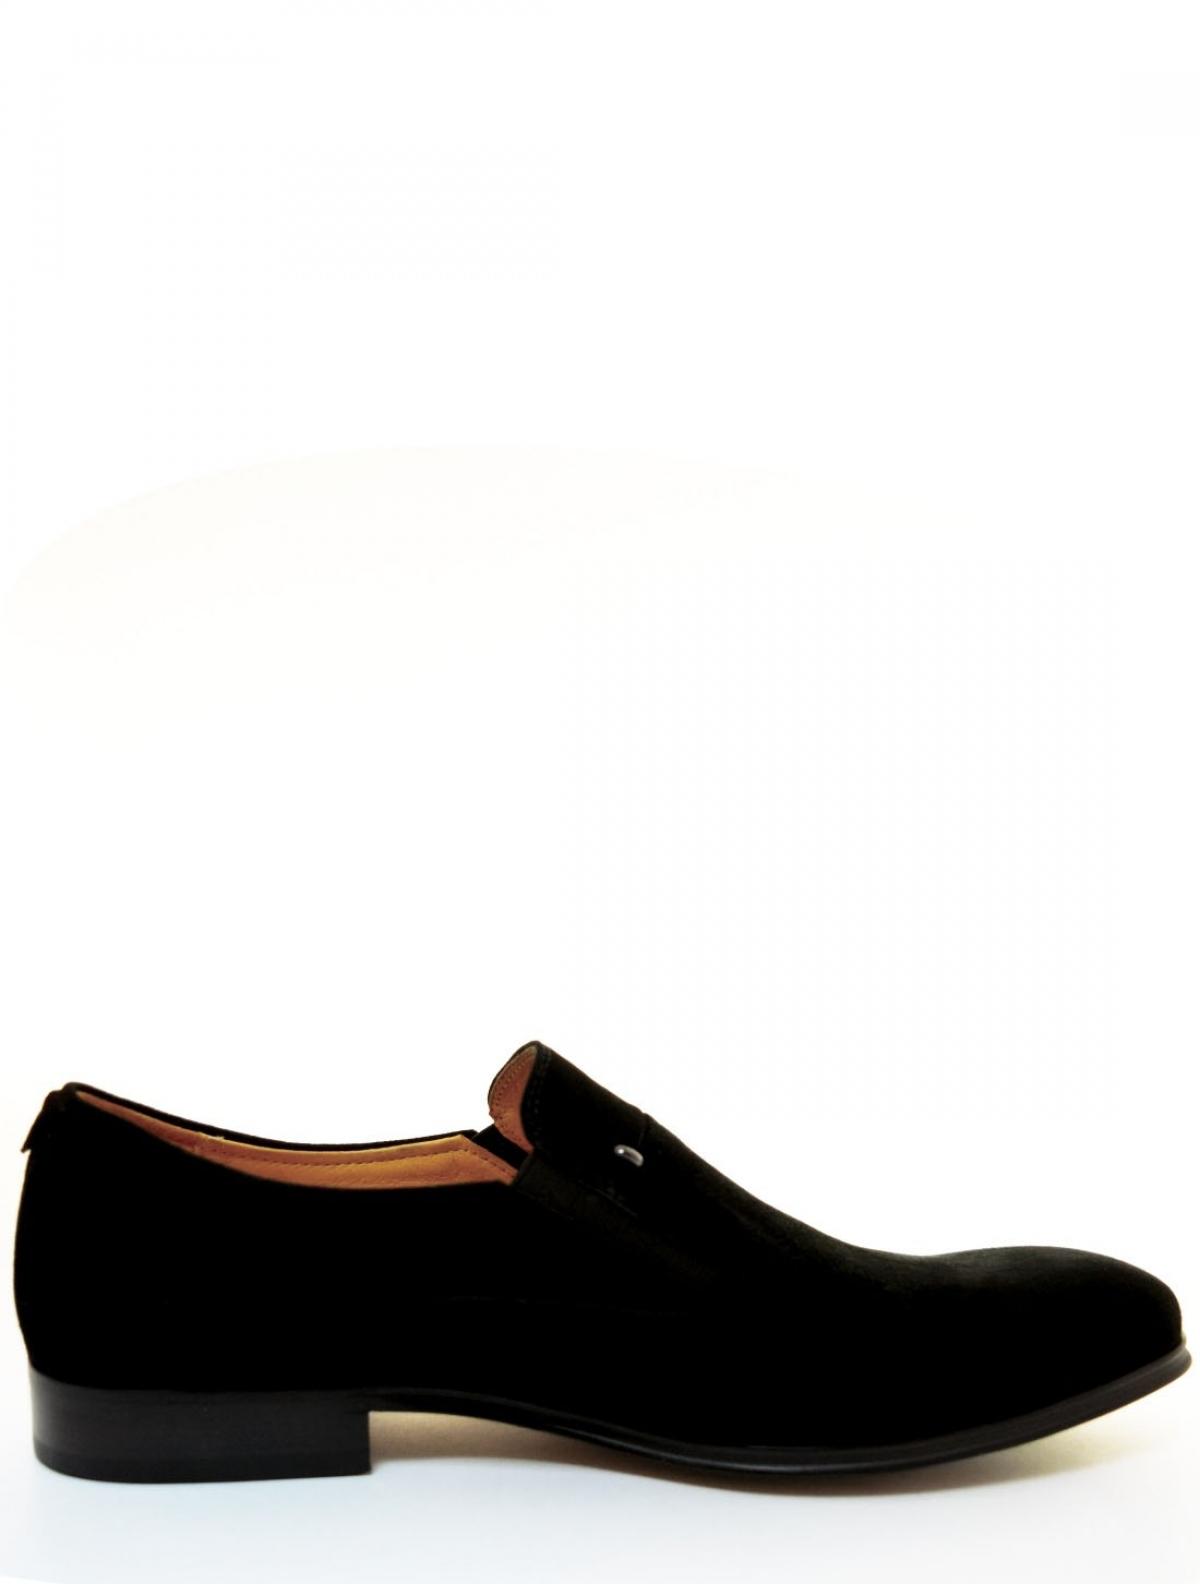 Rosconi J13609-069-095-9754 мужские туфли